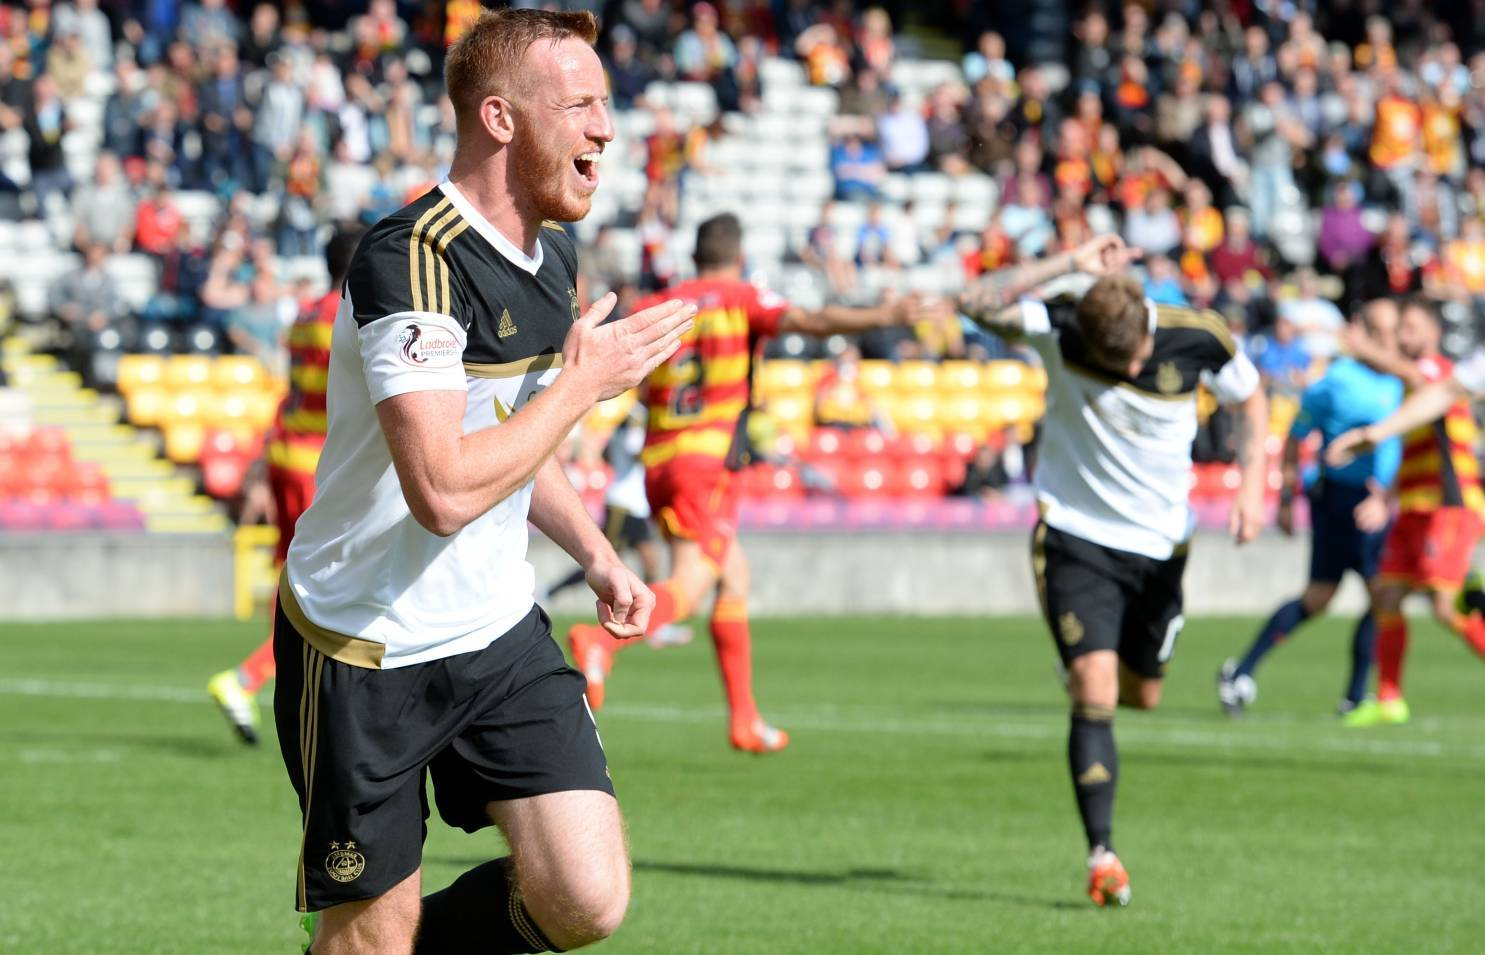 Aberdeen's Adam Rooney celebrates his goal